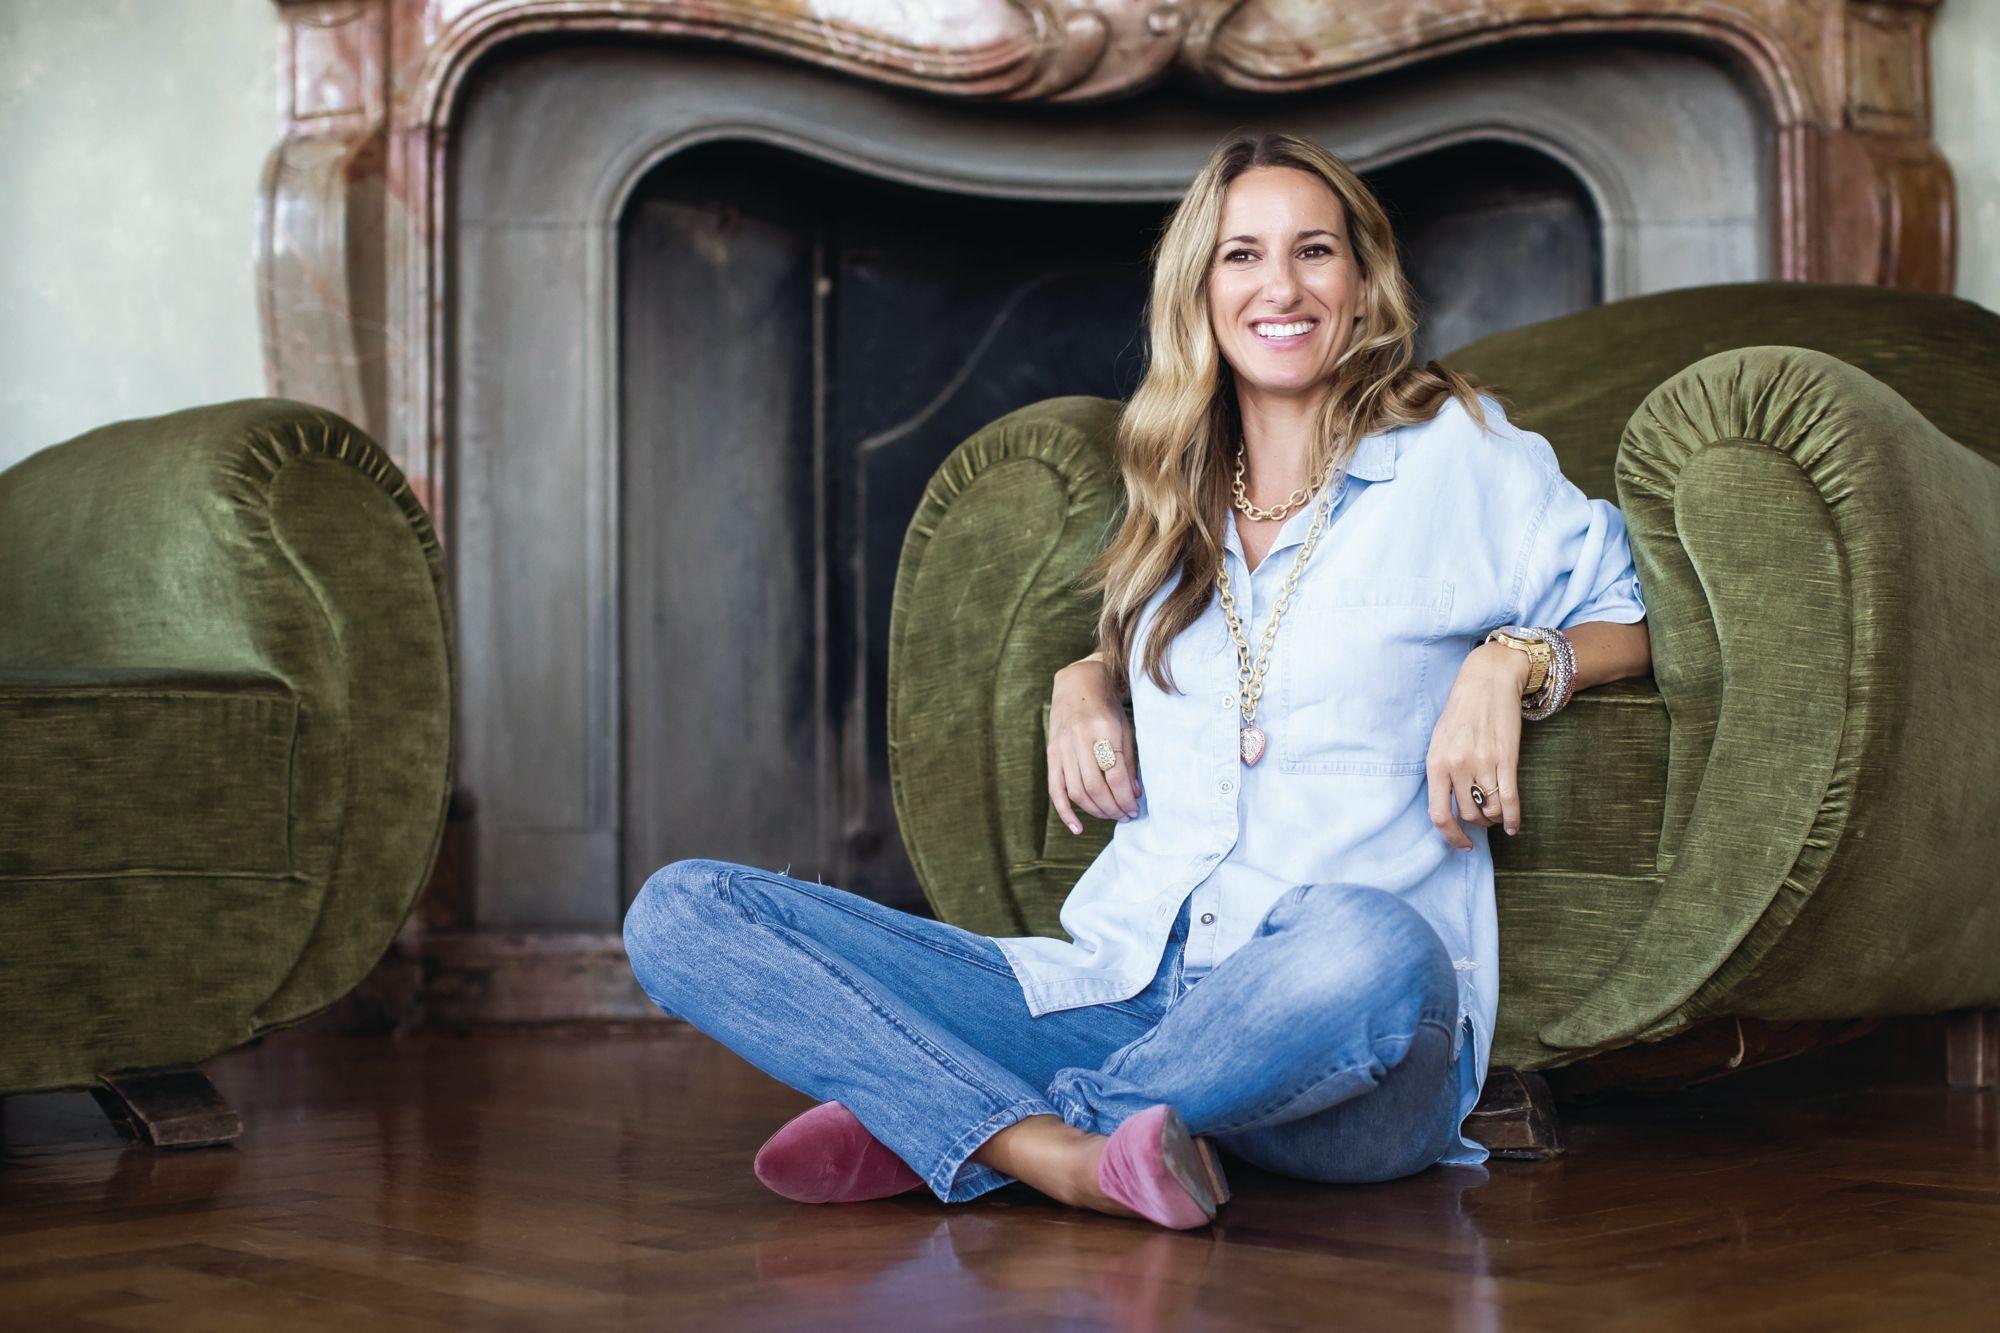 Jewellery Designer Carolina Bucci On The Watch That Changed Her Career